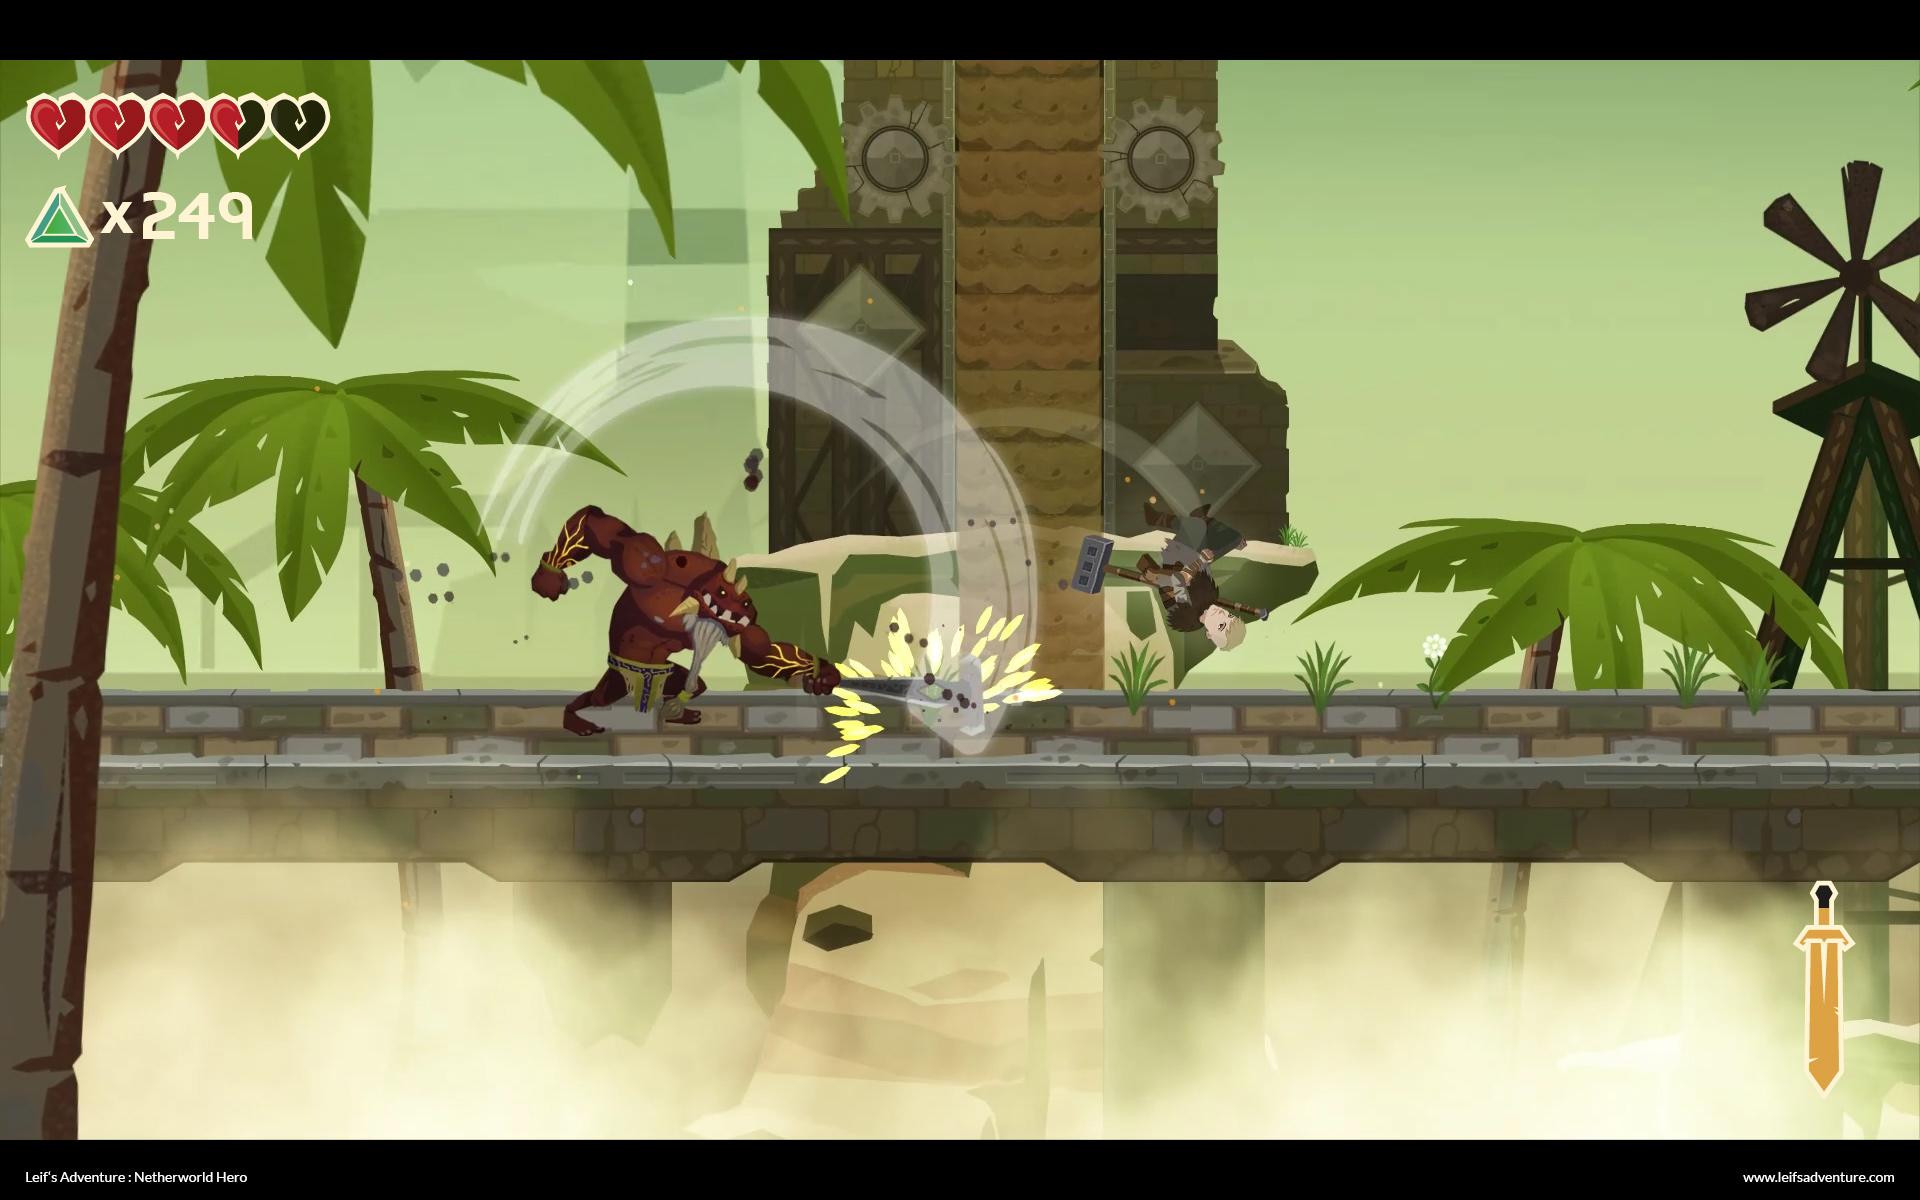 Leif's Adventure: Netherworld Hero coming soon to Nintendo Switch